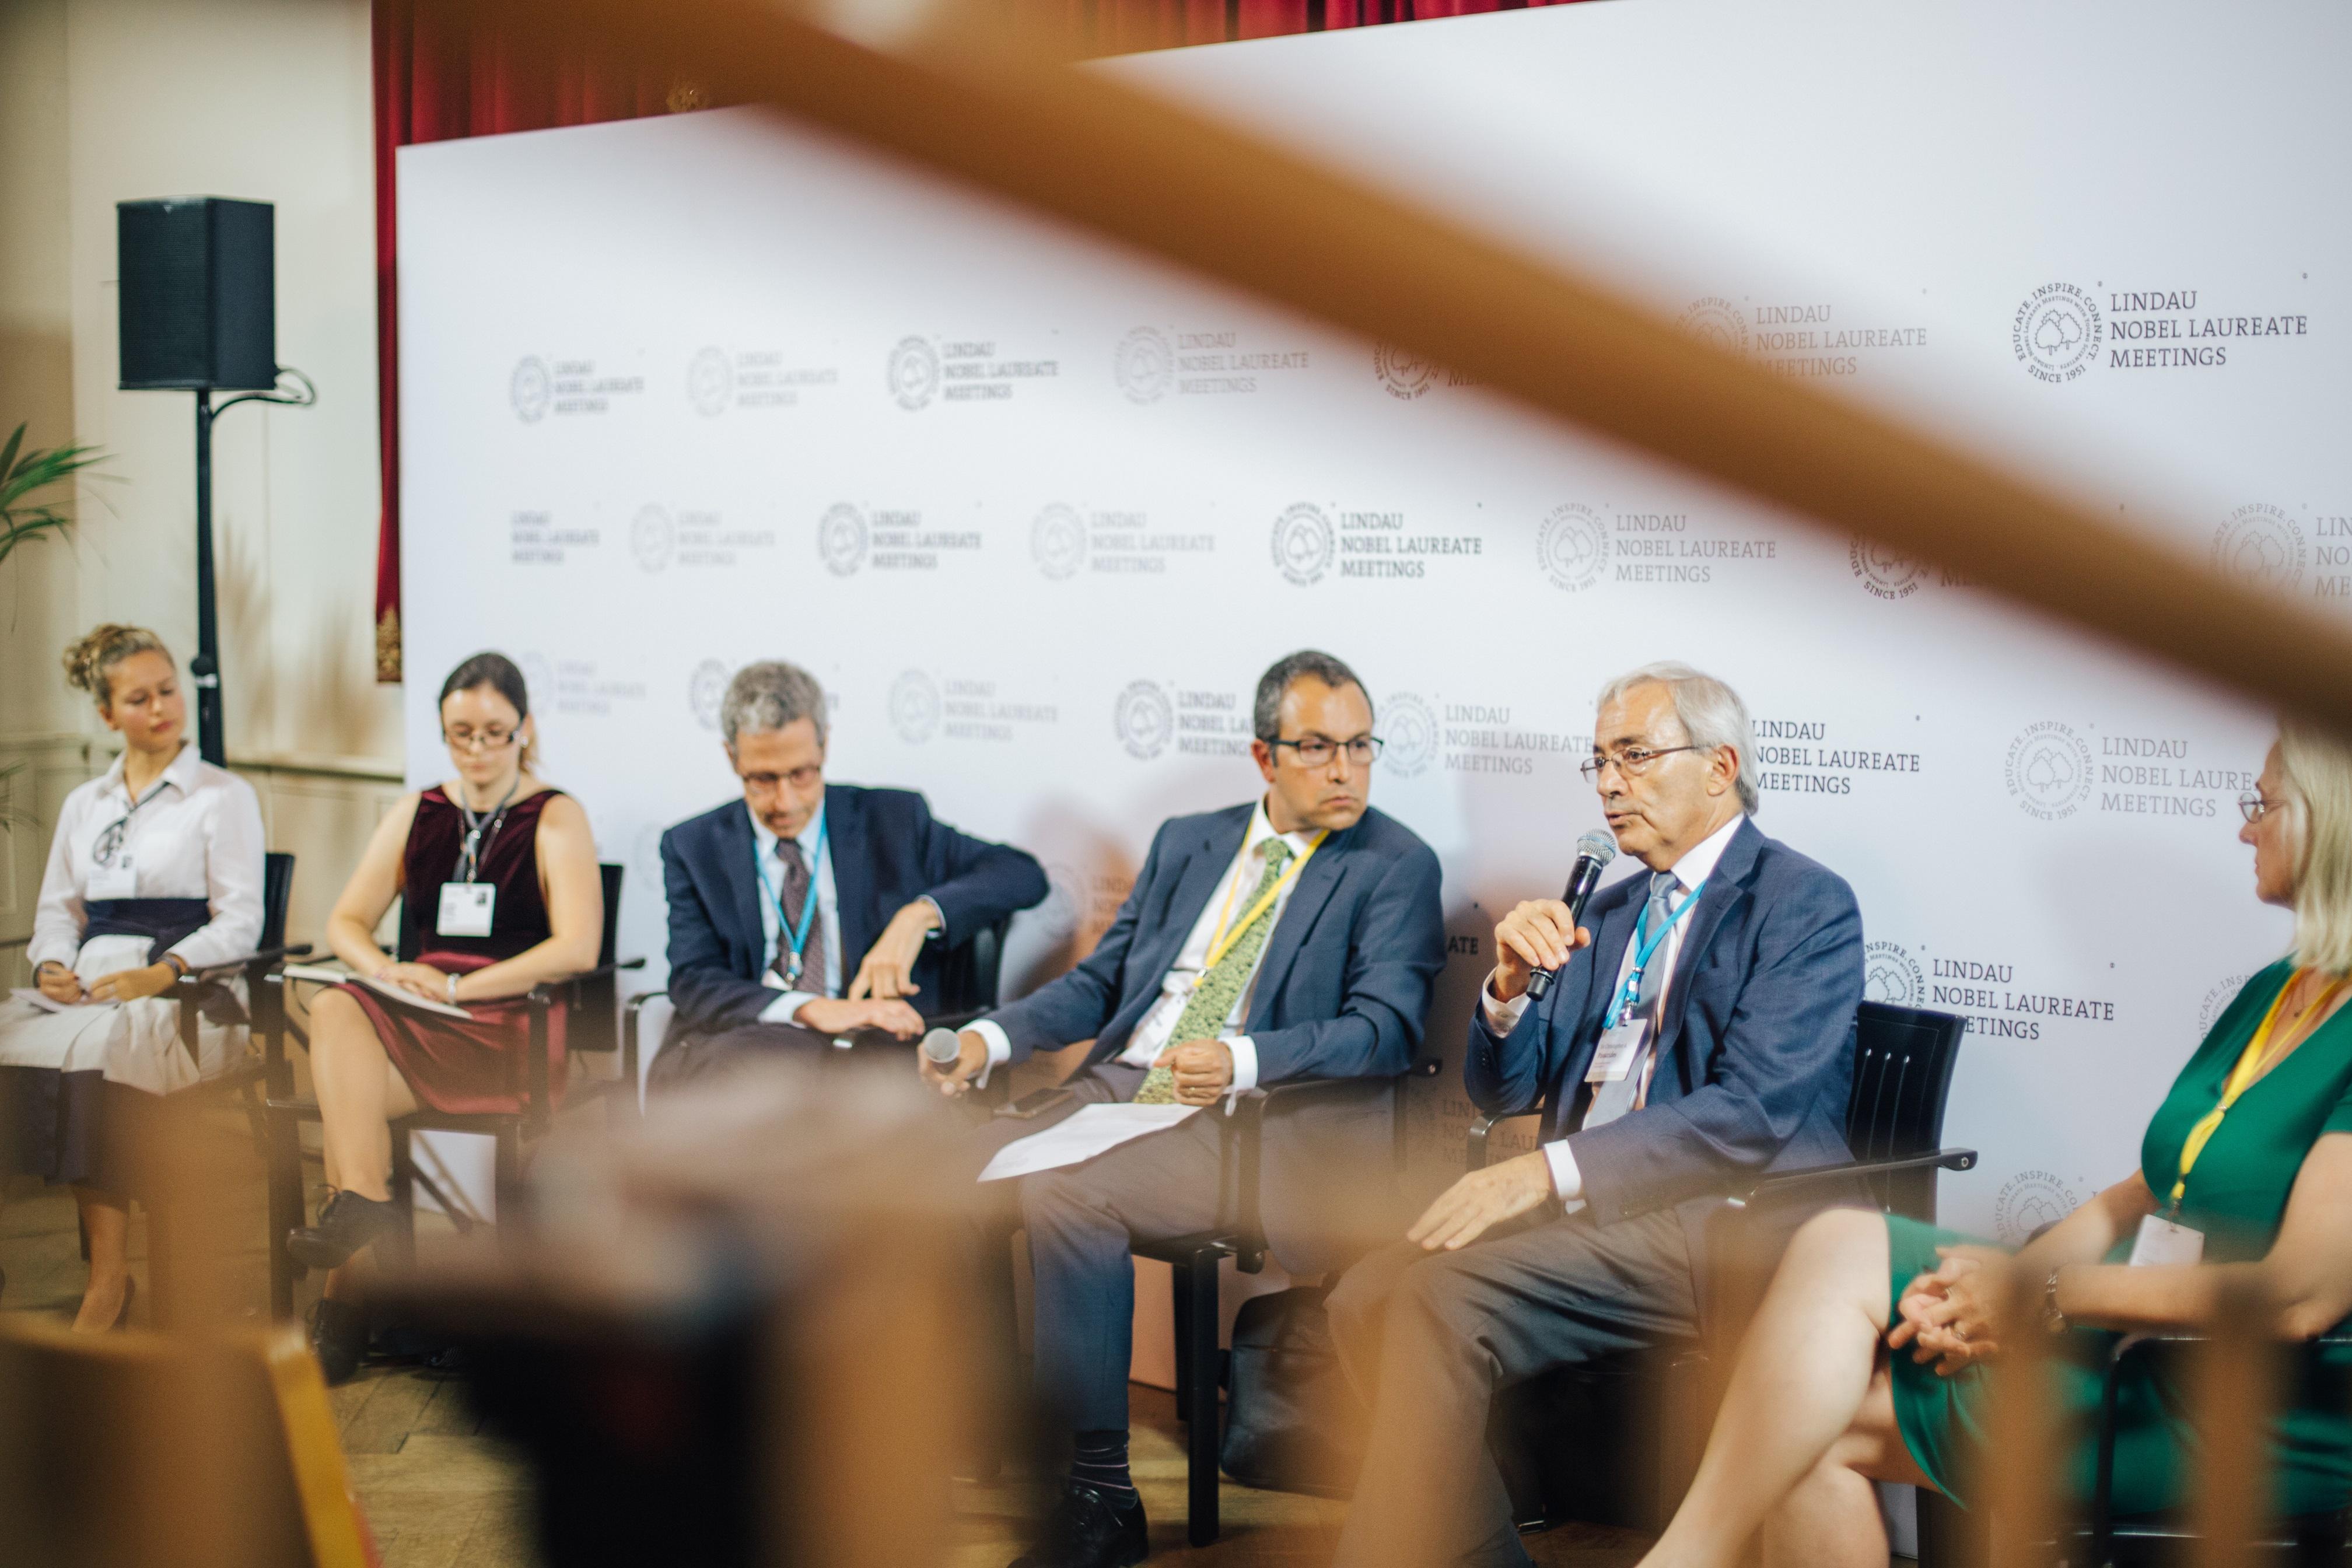 Press Talk at the 6th Lindau Meeting on Economic Sciences. Picture/Credit: Julia Nimke/Lindau Nobel Laureate Meetings